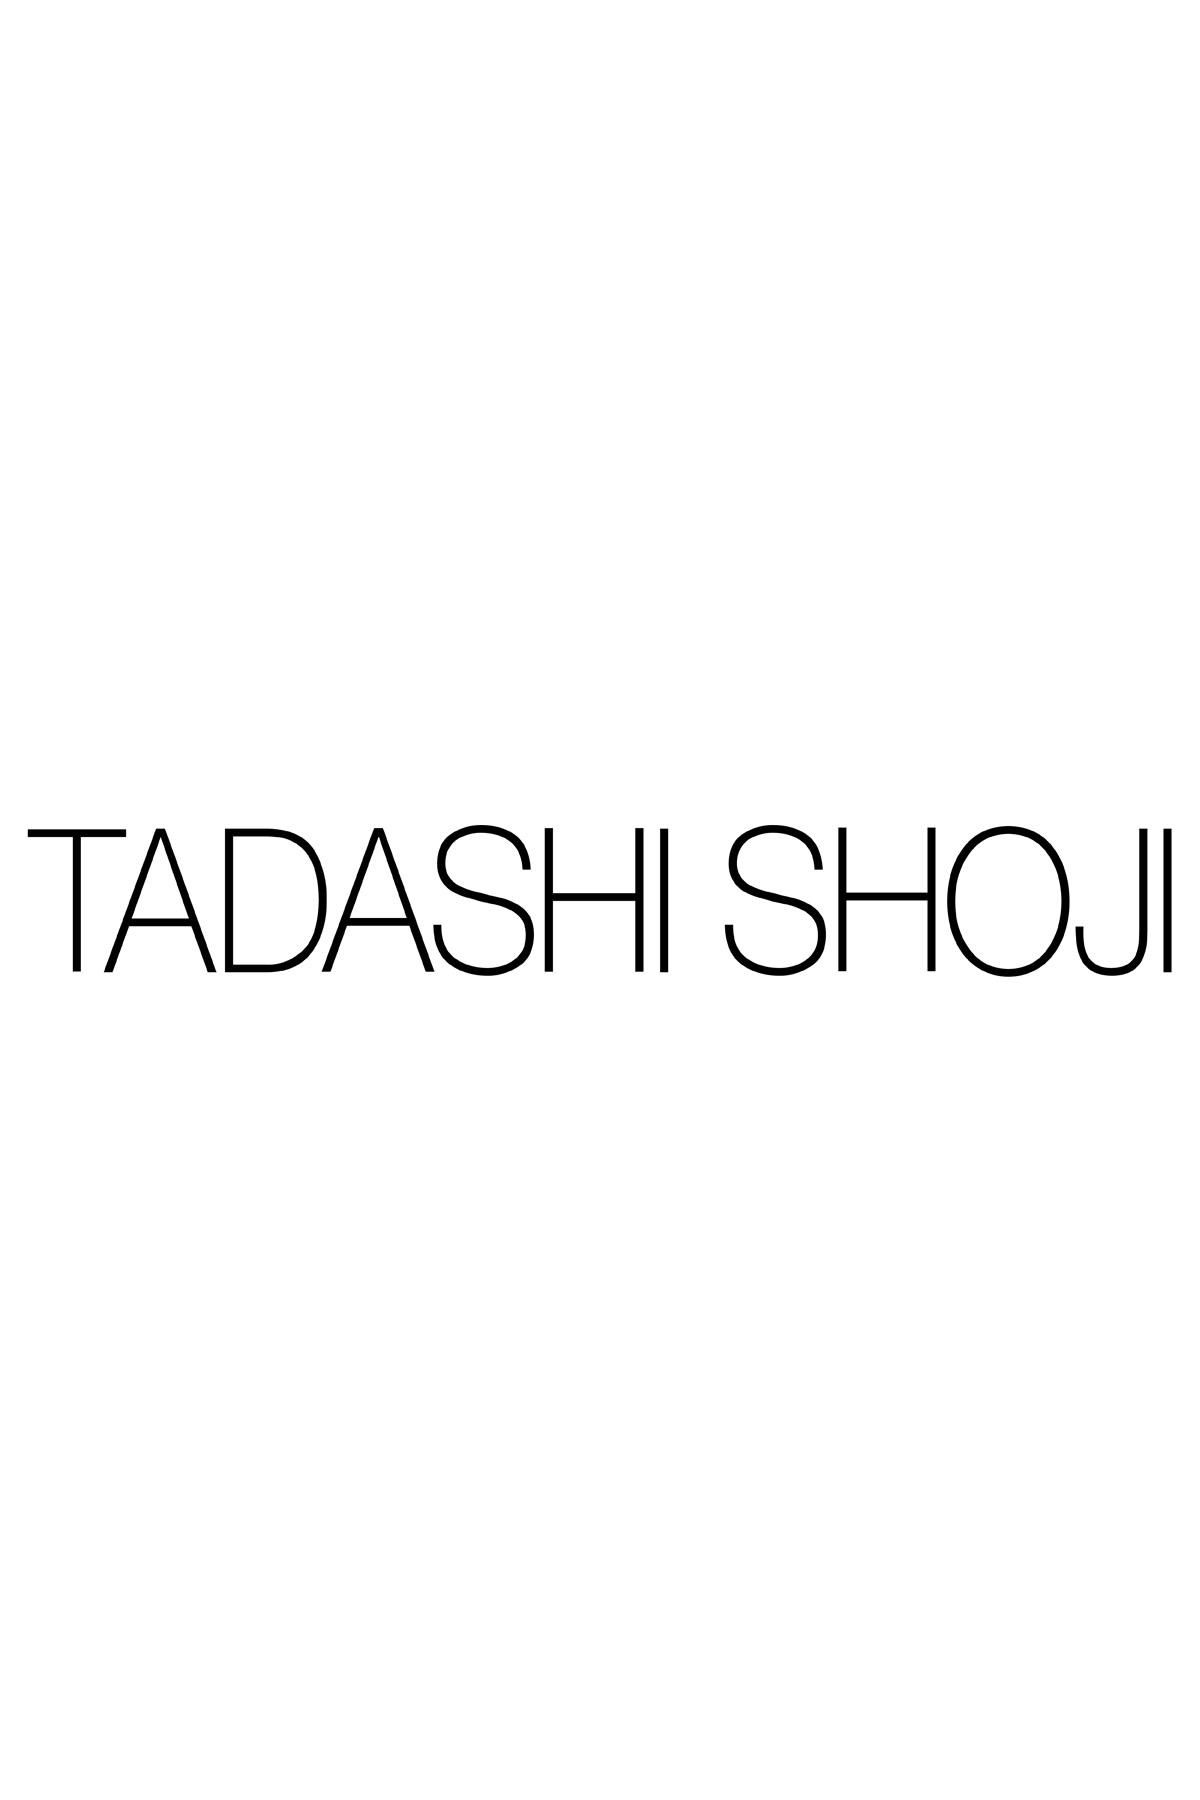 Vihaan Neoprene Embroidered Dress